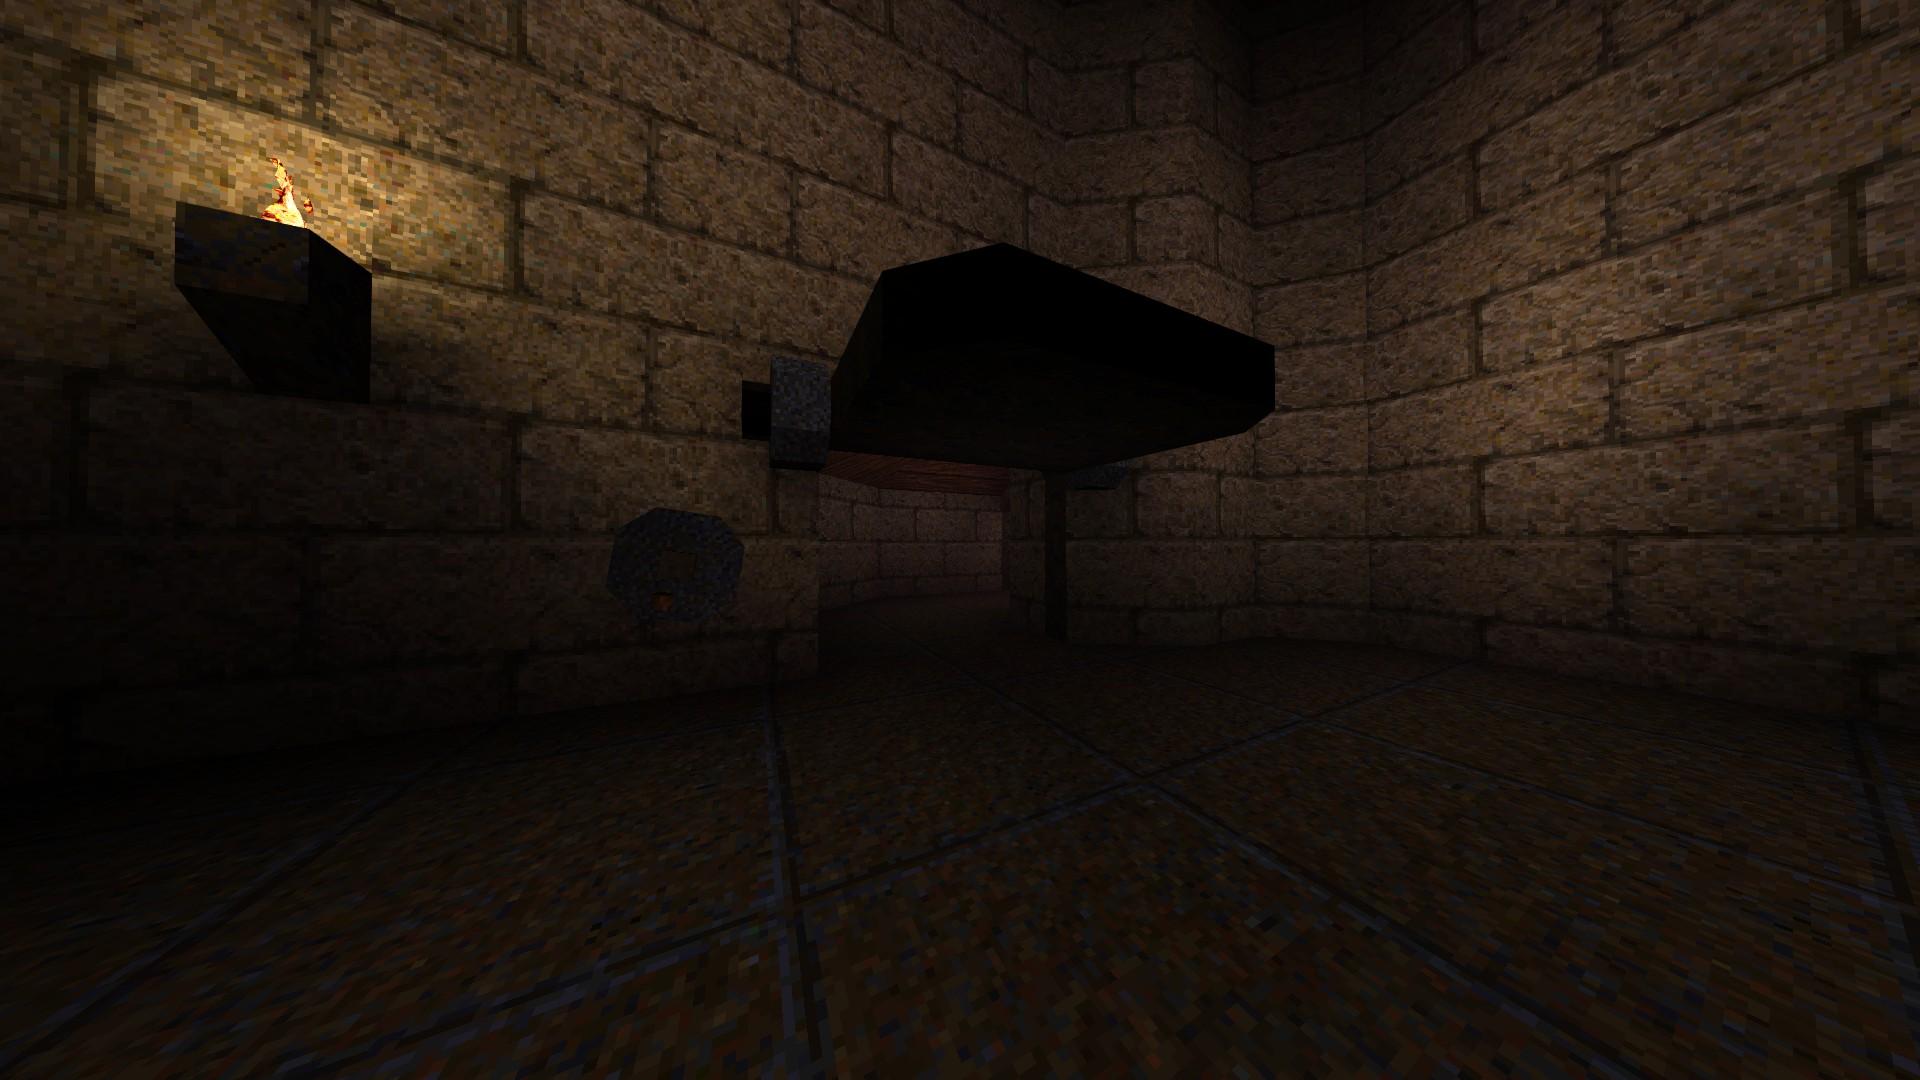 Quake - Locations of All Secrets in Game Tips - E2: Dominion of Darkness - Part I - 7A4152E